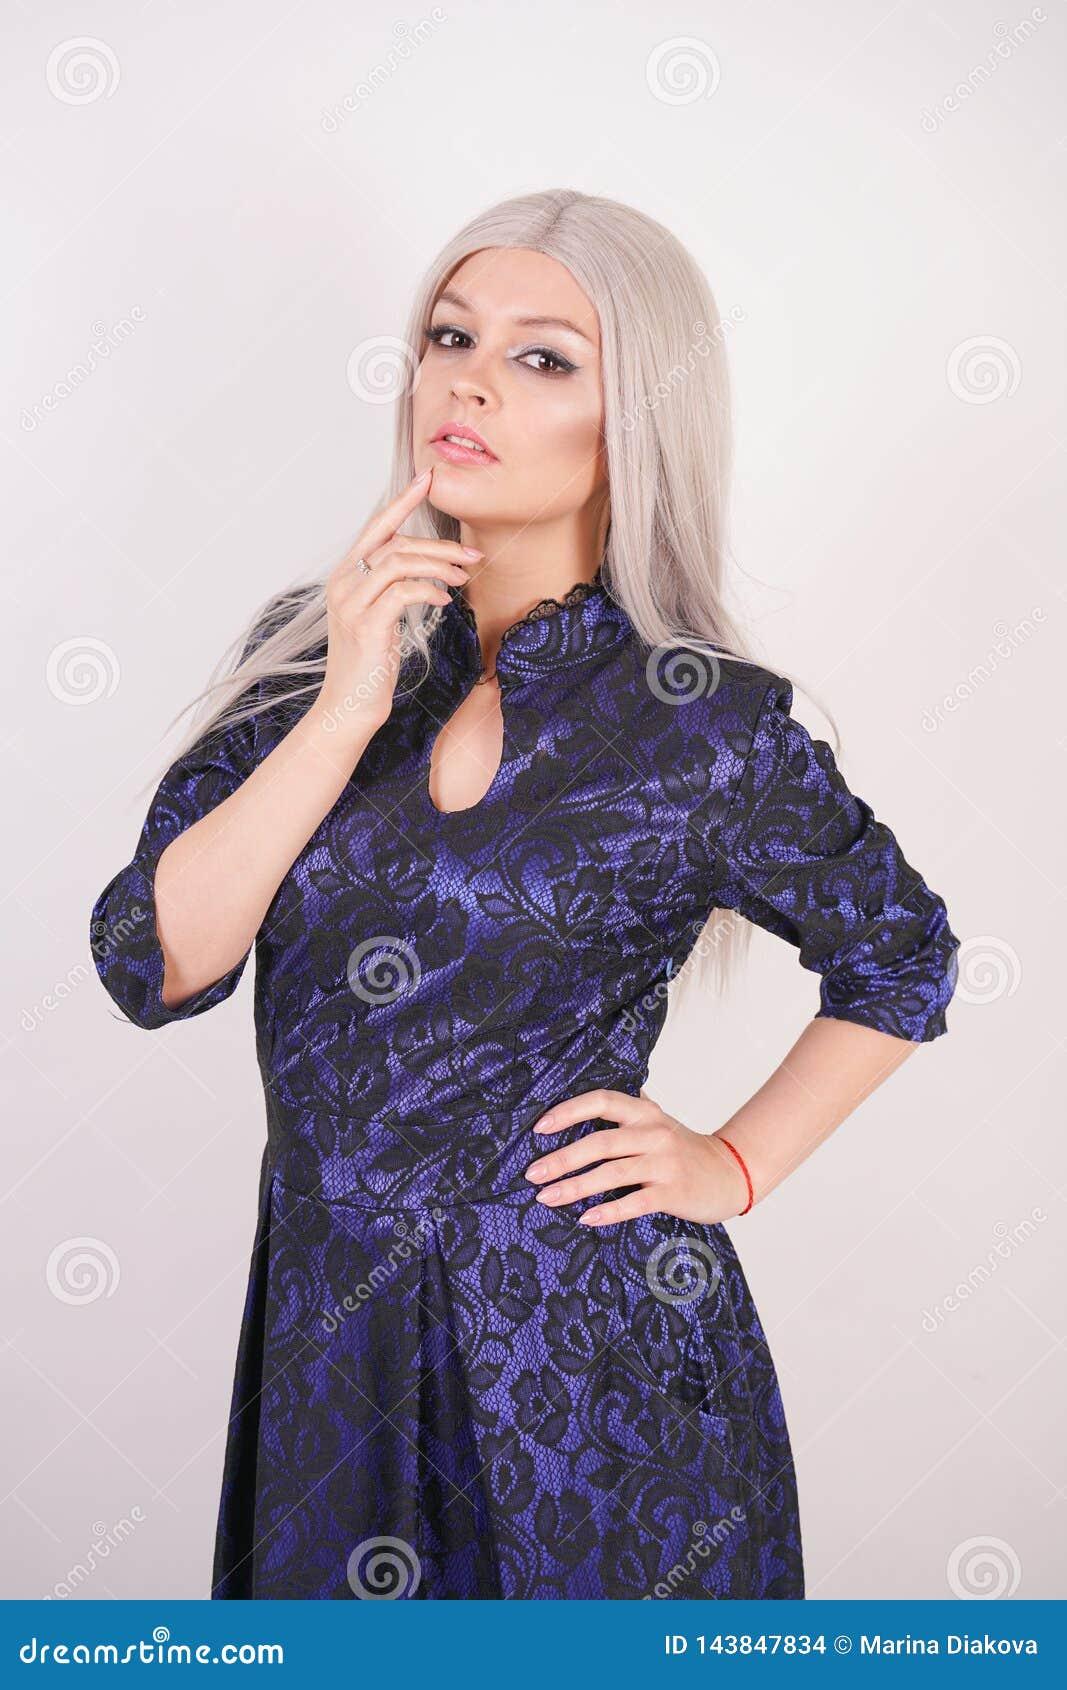 Mooi blondemeisje in luxueuze blauw met zwarte kantavondjurk op witte achtergrond in Studio